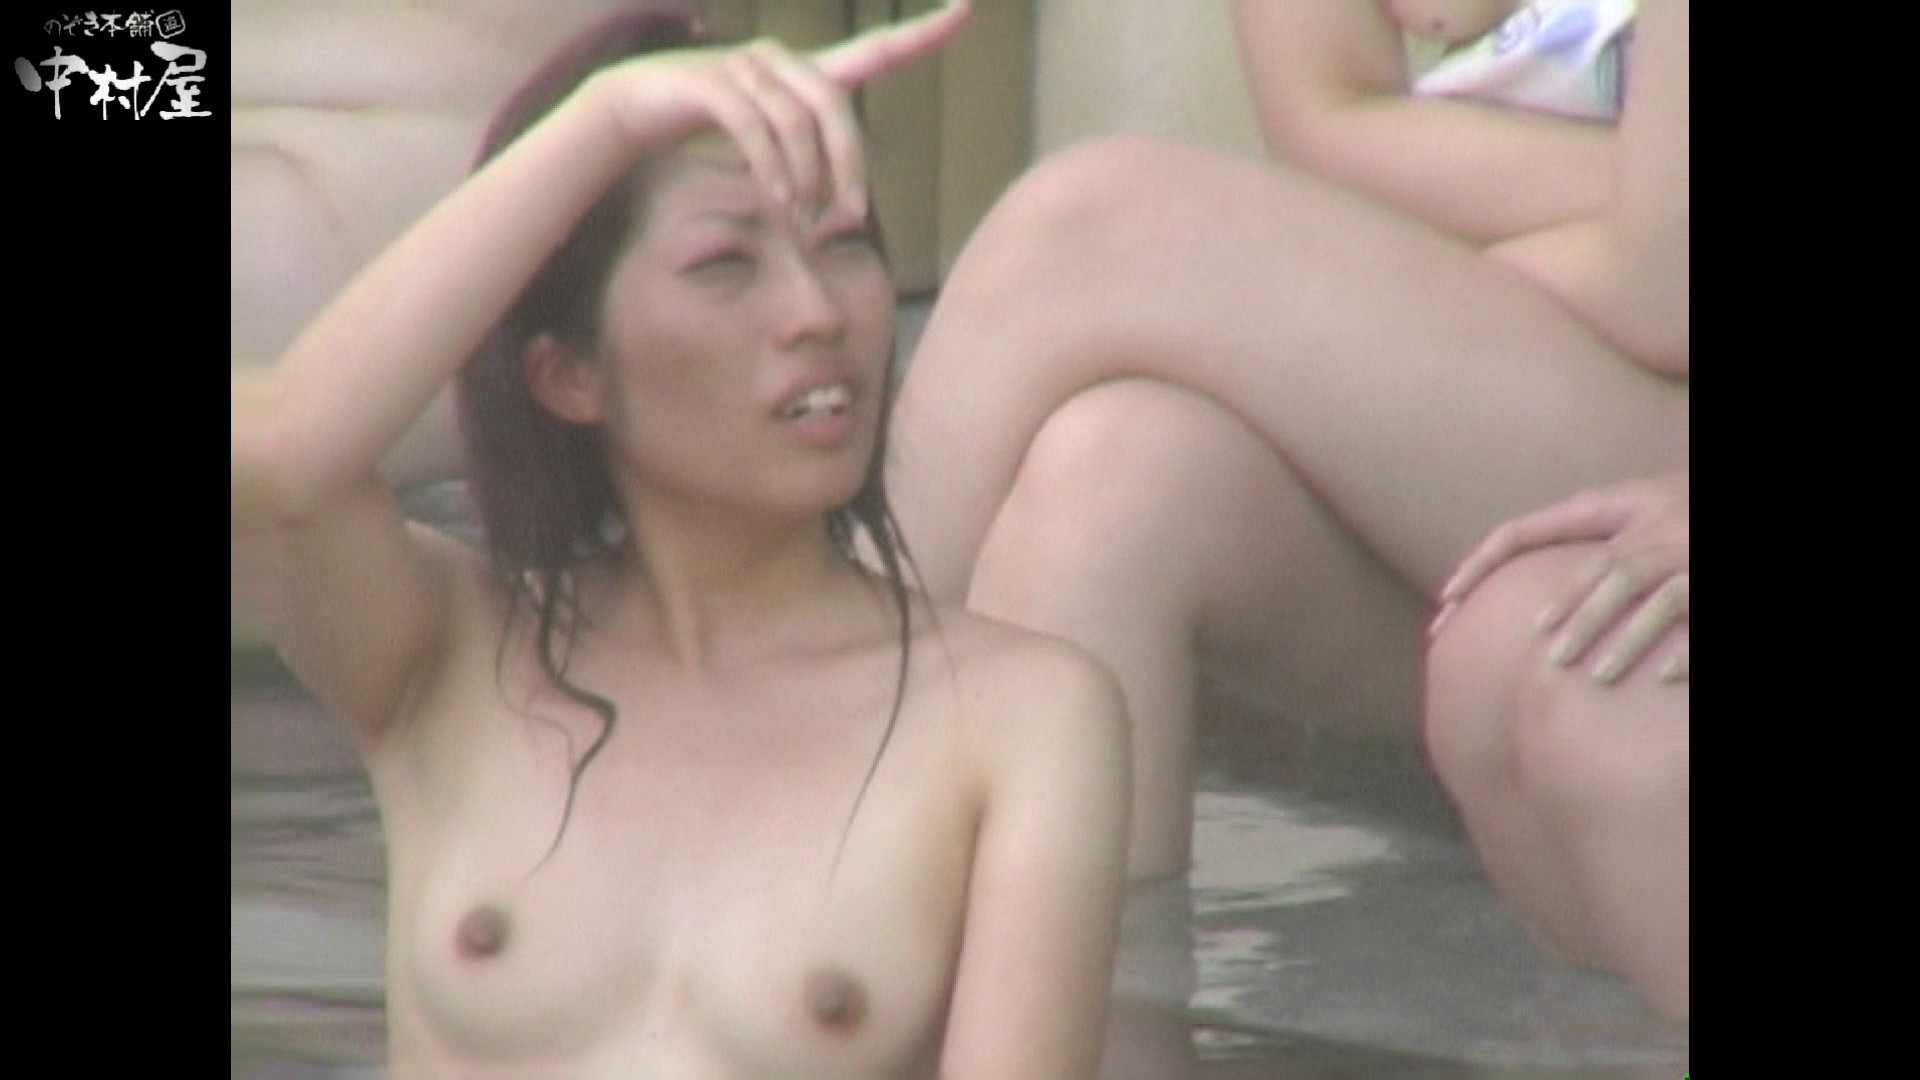 Aquaな露天風呂Vol.940 OLセックス  98画像 33